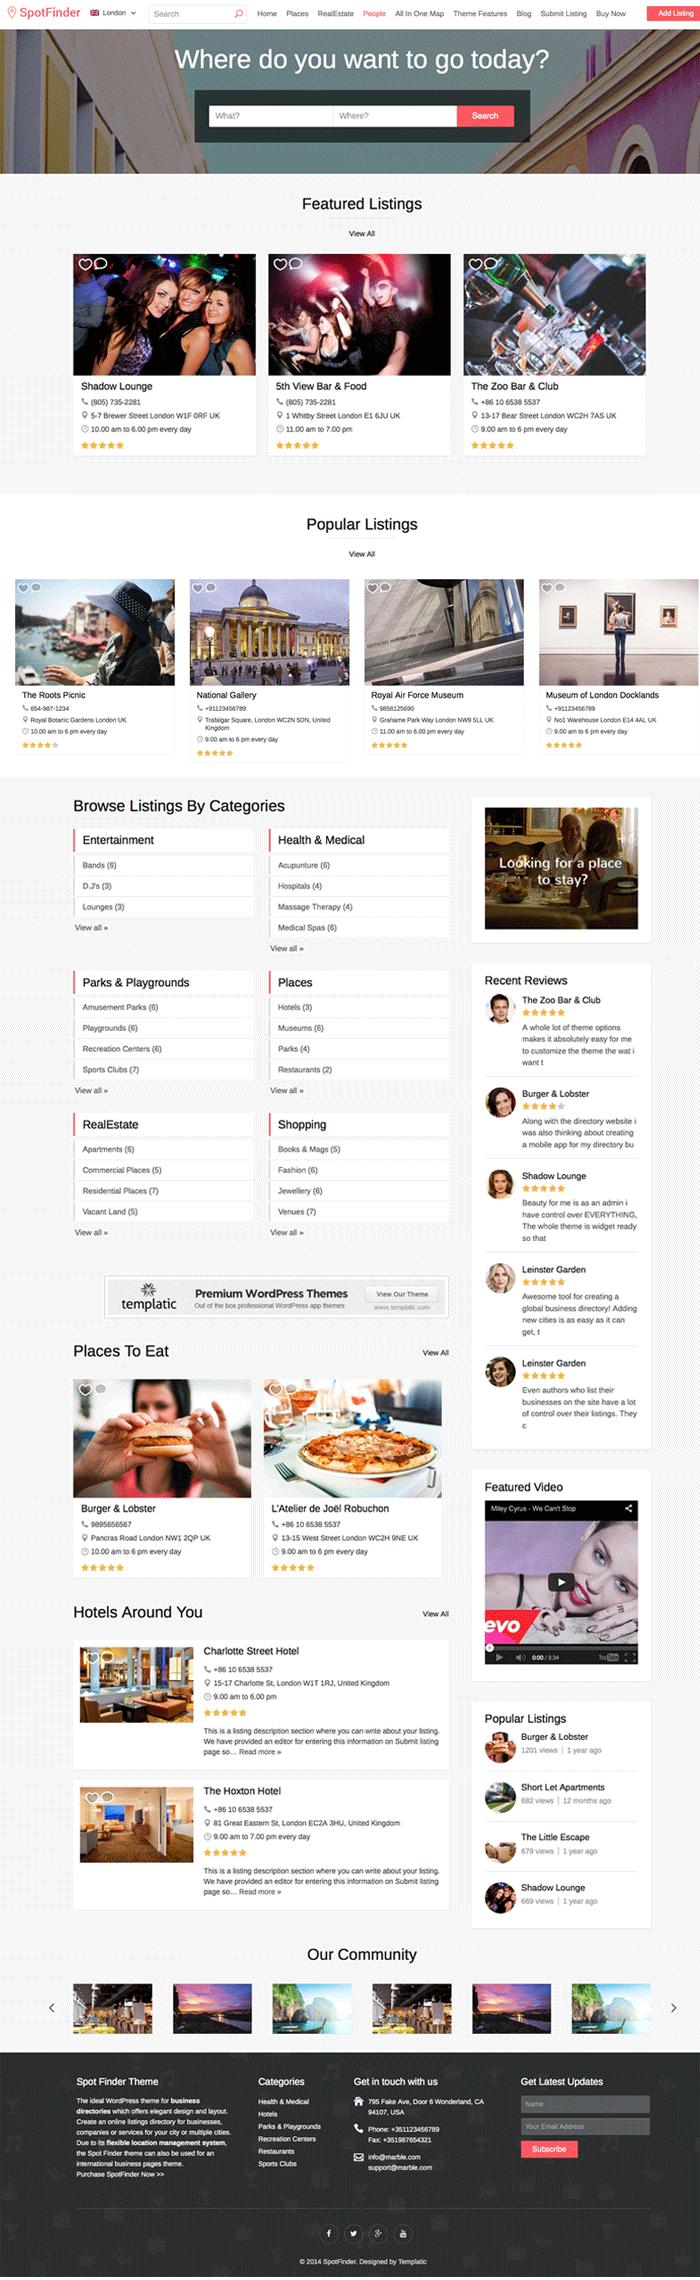 SpotFinder-WordPress-Rental-Lodging-Theme